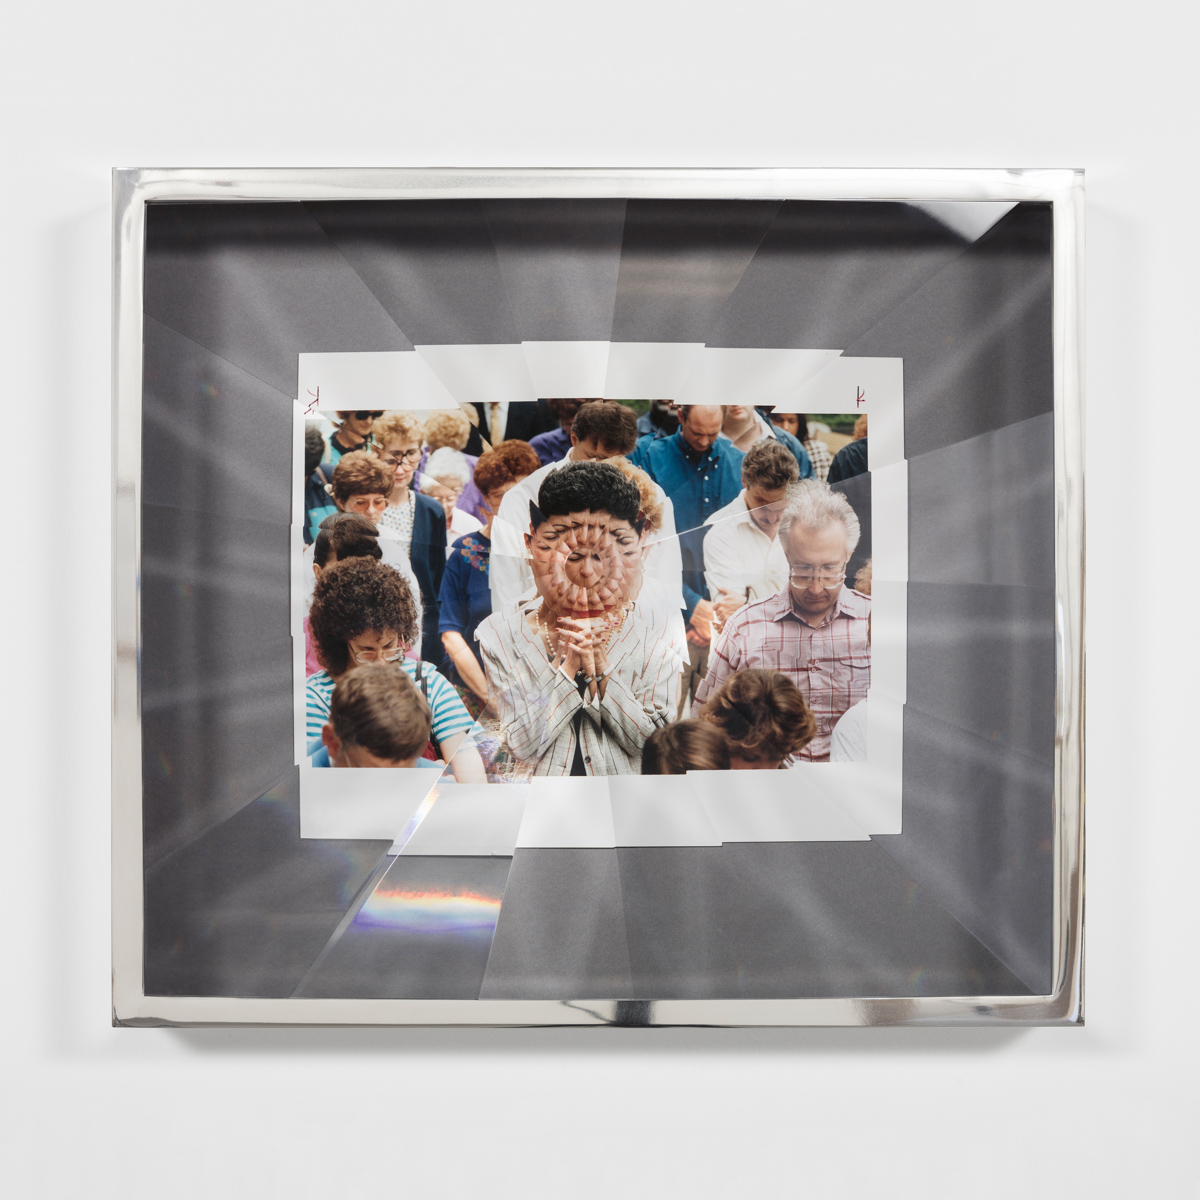 © Jeremy Shaw, courtesy the Artist and König Galerie Berlin, London, Tokyo. Photo. Timo Ohler